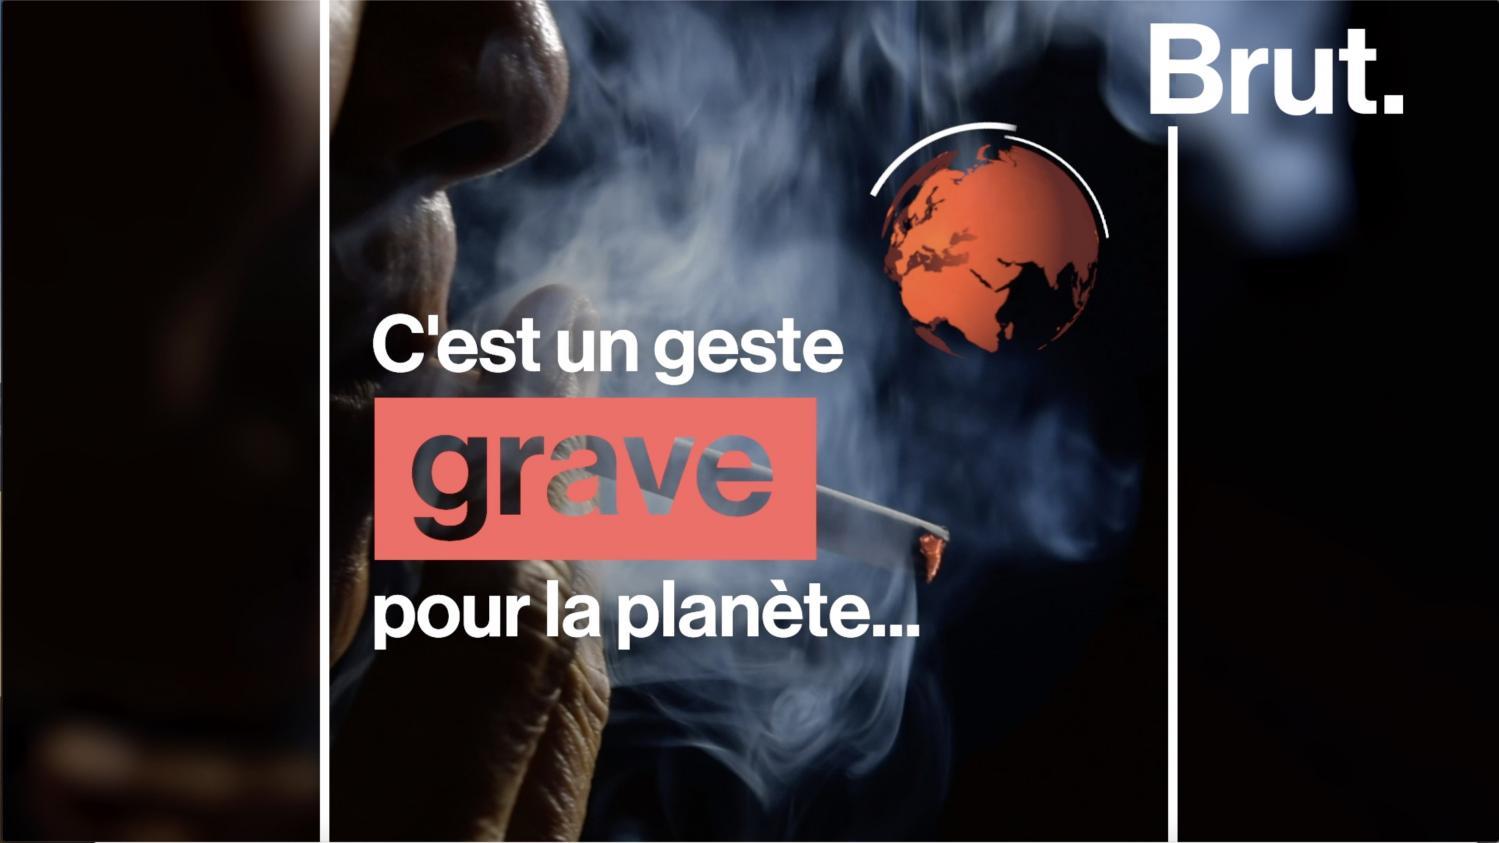 video  d u00e9forestation  gaz  u00e0 effet de serre u2026 fumer nuit gravement  u00e0 notre environnement